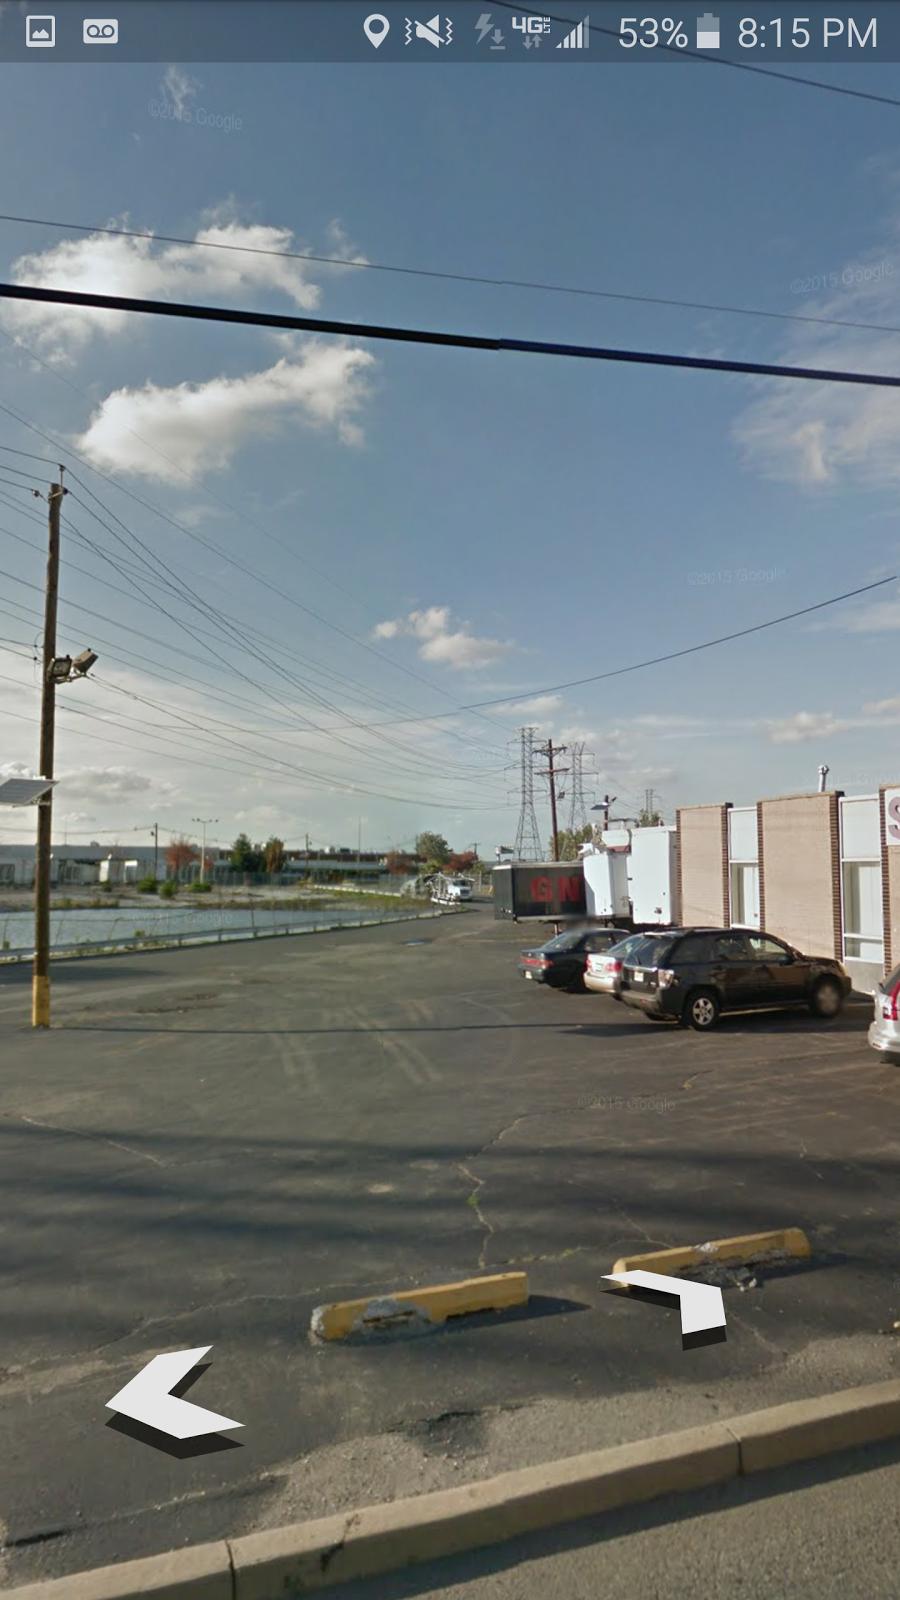 Bram Auto Group - storage  | Photo 6 of 7 | Address: 7500 West Side Ave, North Bergen, NJ 07047, USA | Phone: (201) 255-1200